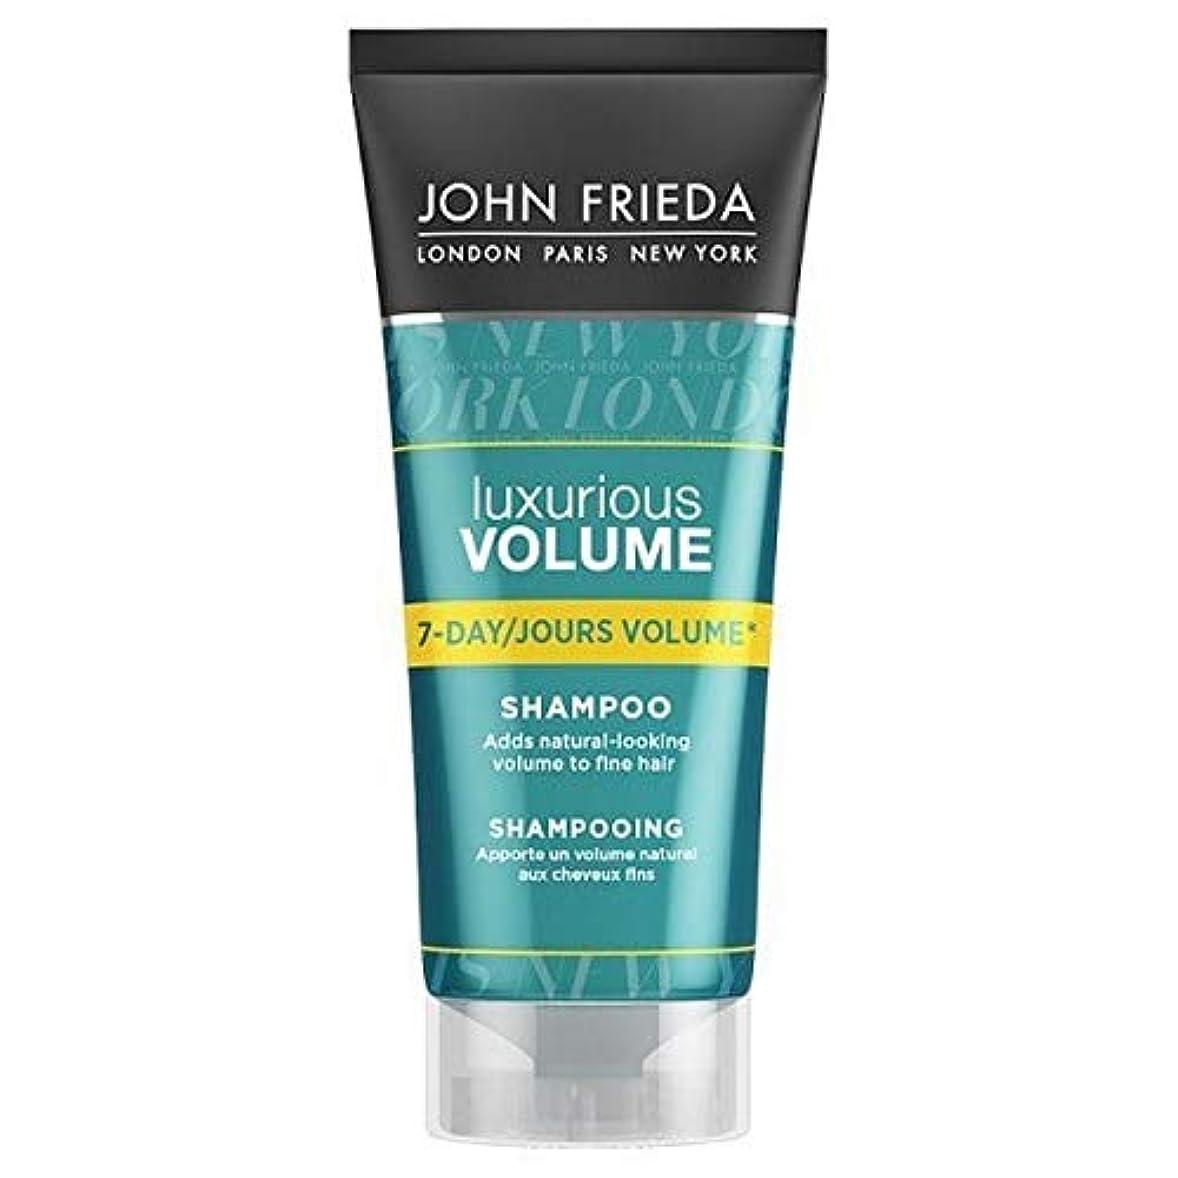 [John Frieda ] ジョン?フリーダ贅沢なボリューム肥厚シャンプー50ミリリットル - John Frieda Luxurious Volume Thickening Shampoo 50ml [並行輸入品]